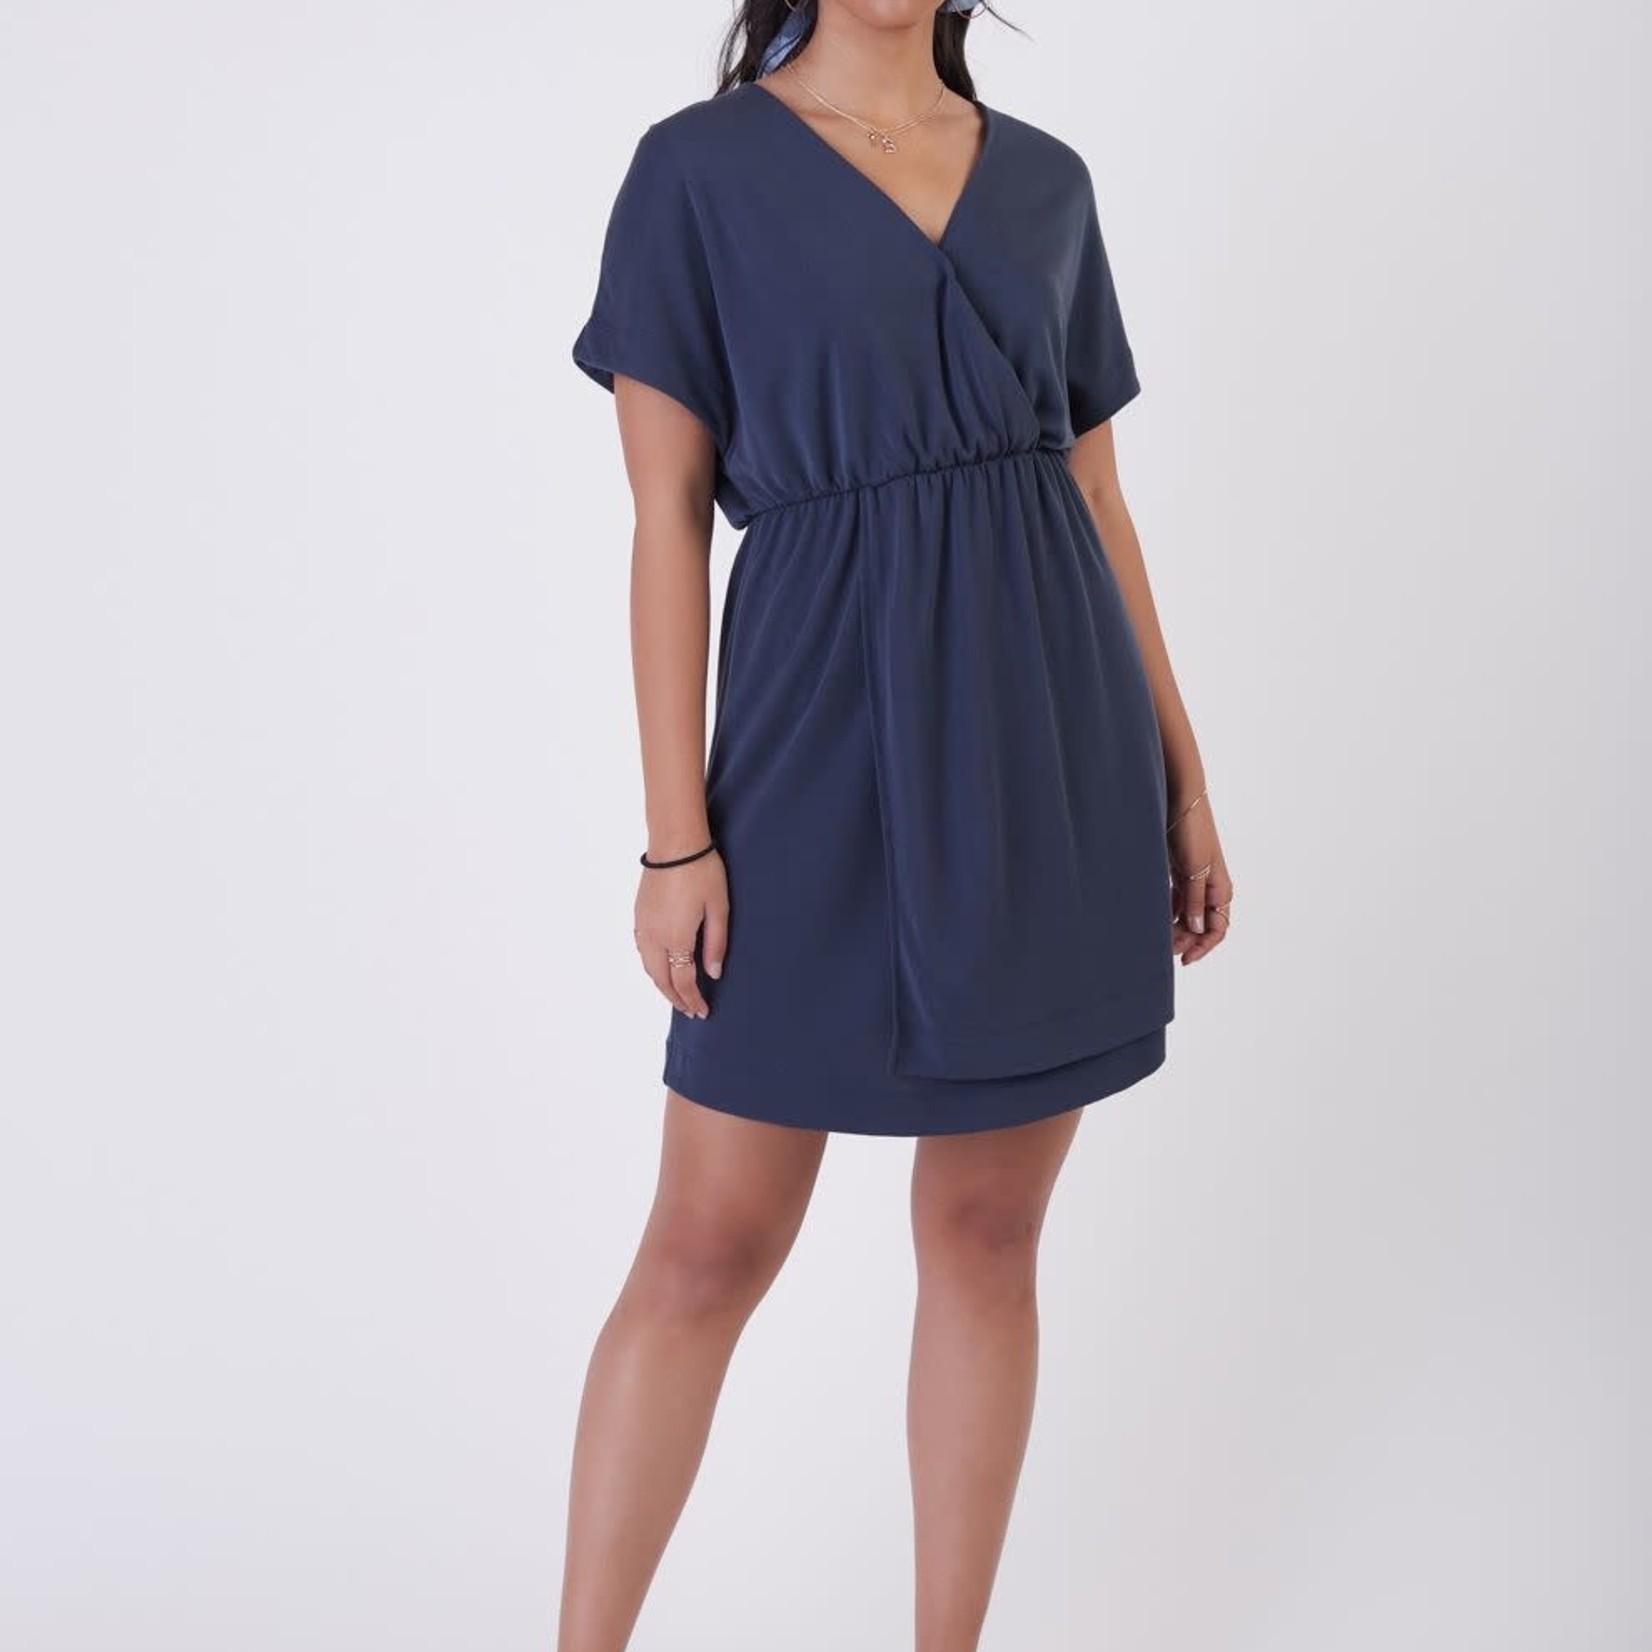 Black Tape SS Simple Knit Wrap Dress